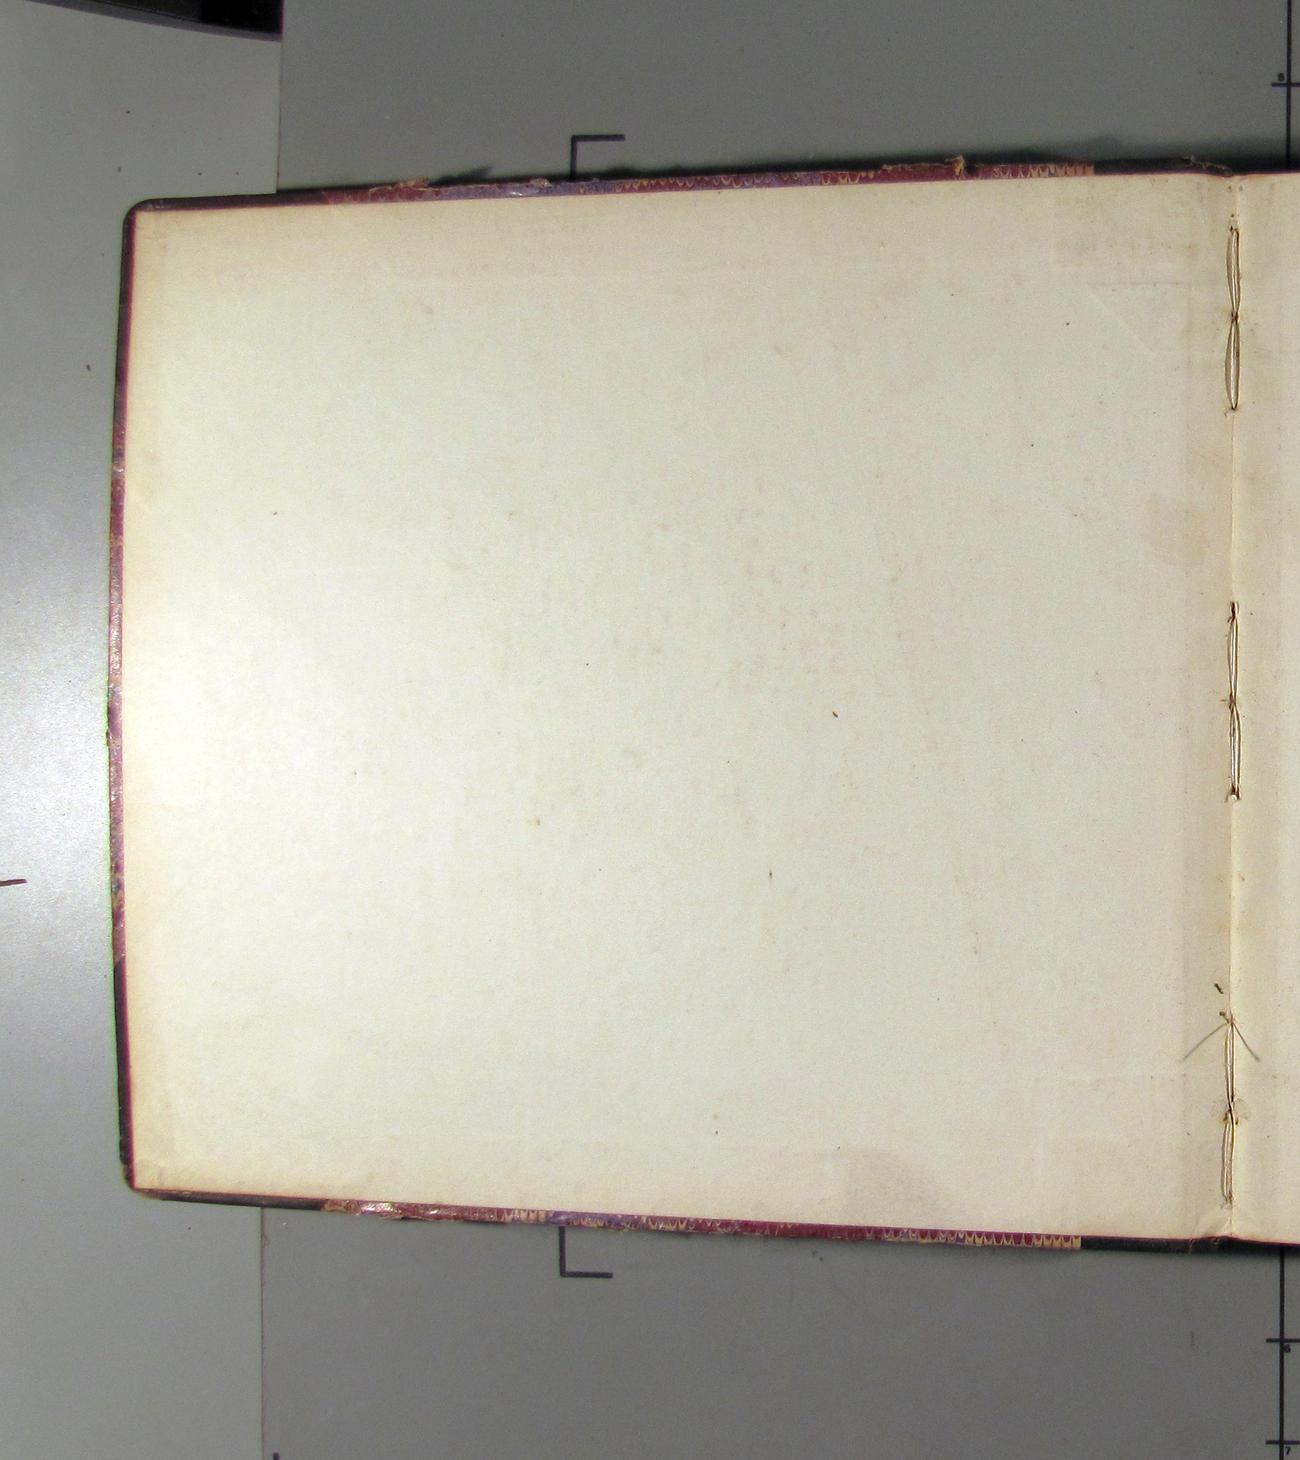 USC&GSS Carlile P  Patterson 1913-1914 Log Books